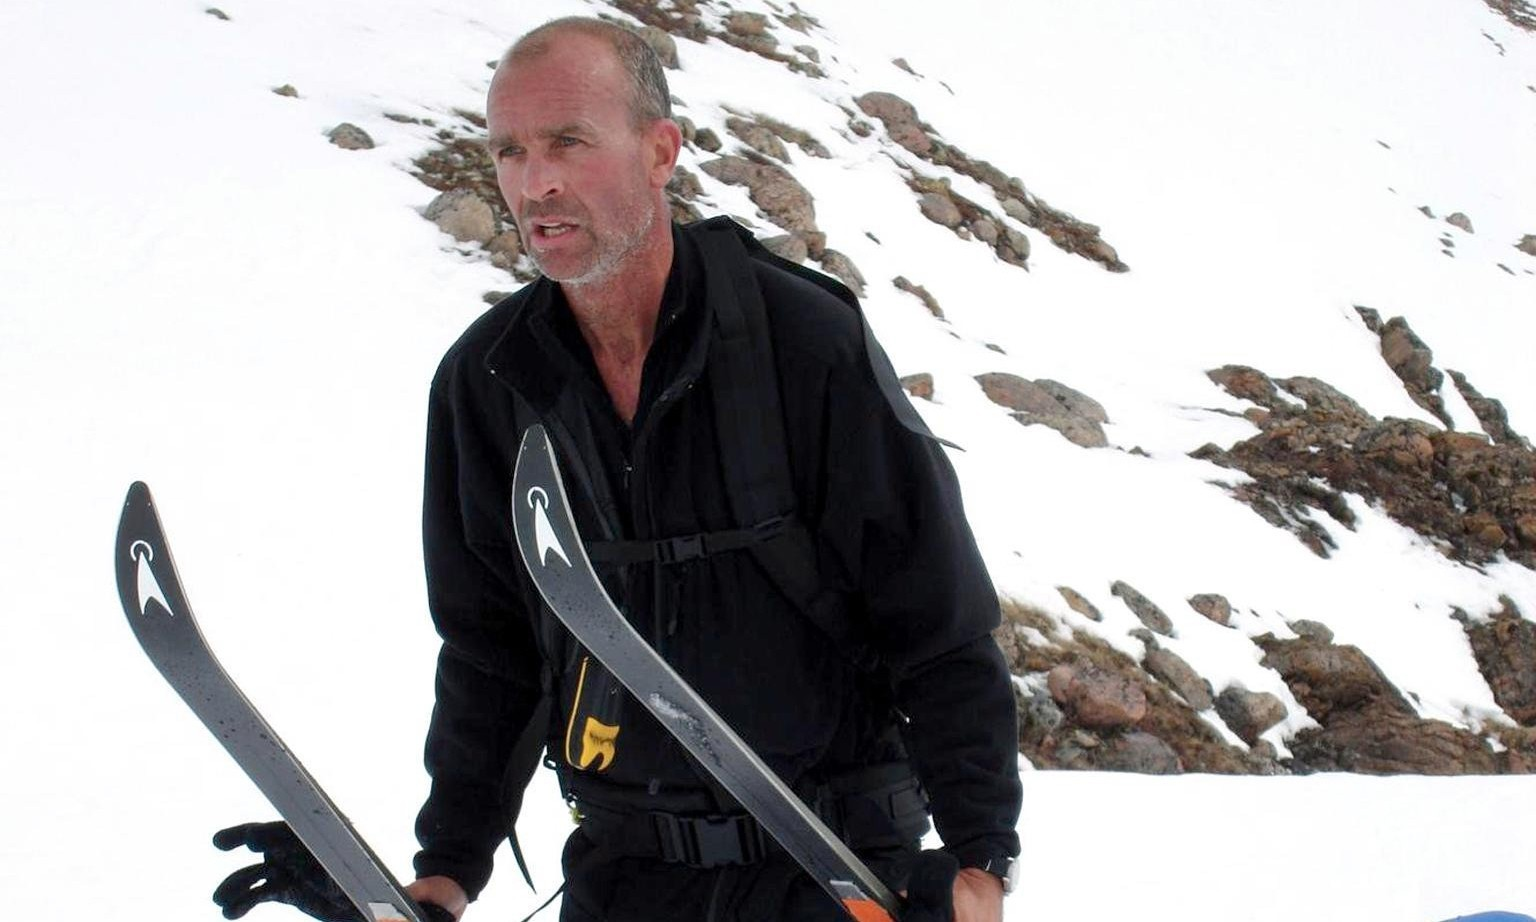 Explorer Henry Worsley dies attempting record unaided Antarctic crossing